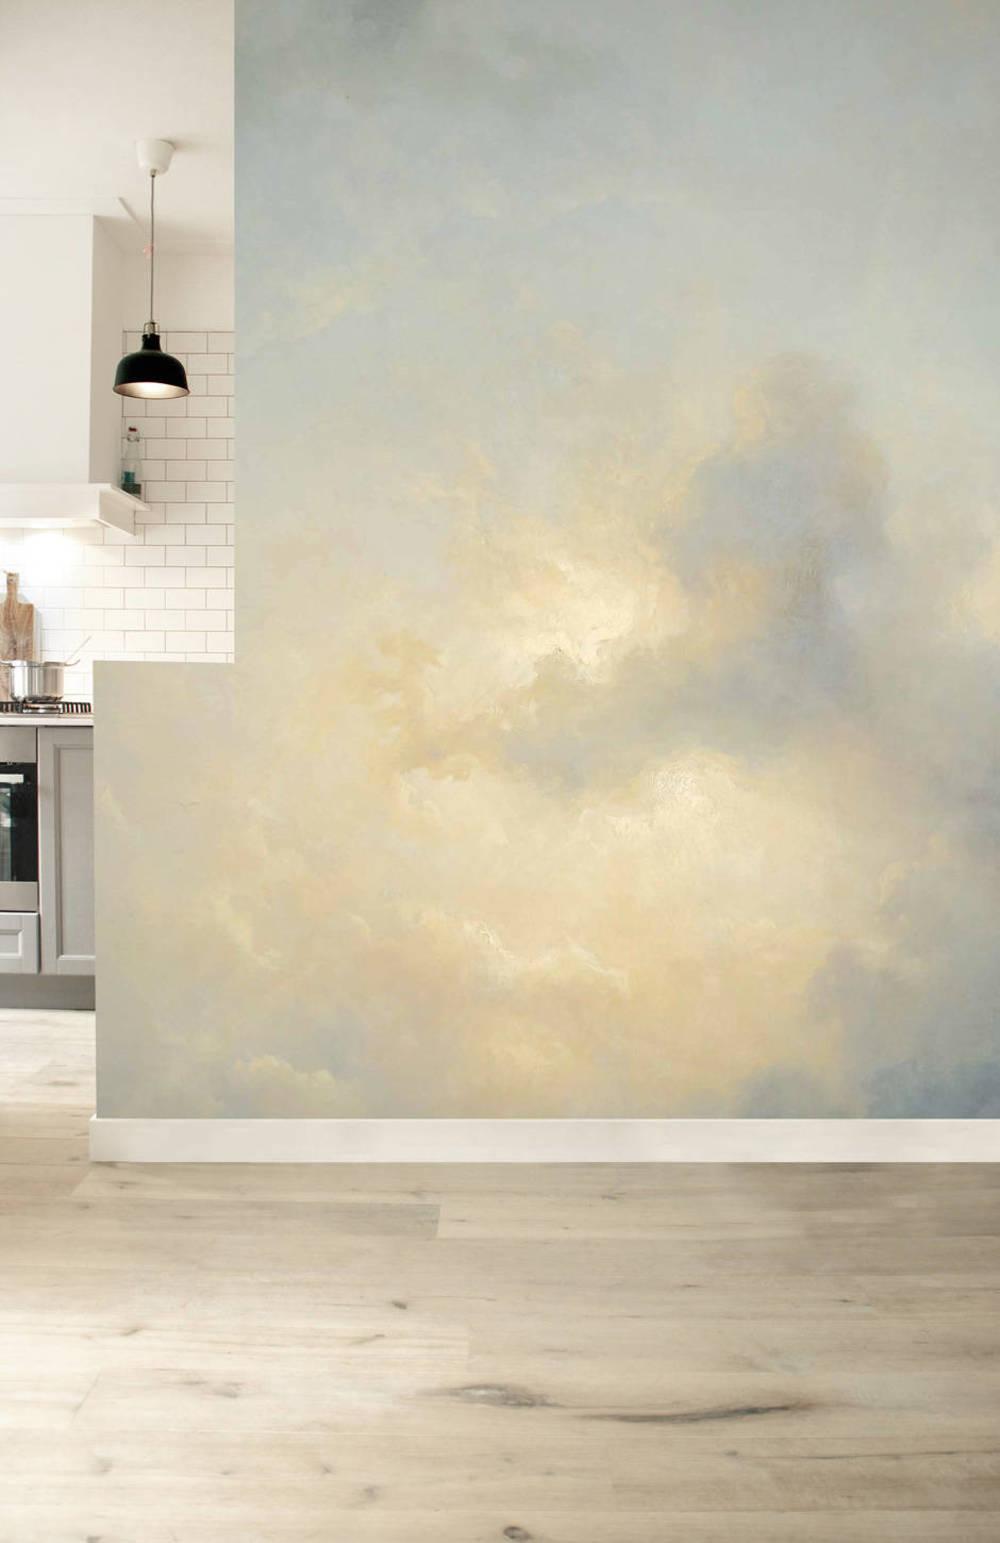 Dutch Wallcoverings Behang.Behang Dutch Wallcoverings Kek Golden Age Clouds Wp 395 Behangsite Com